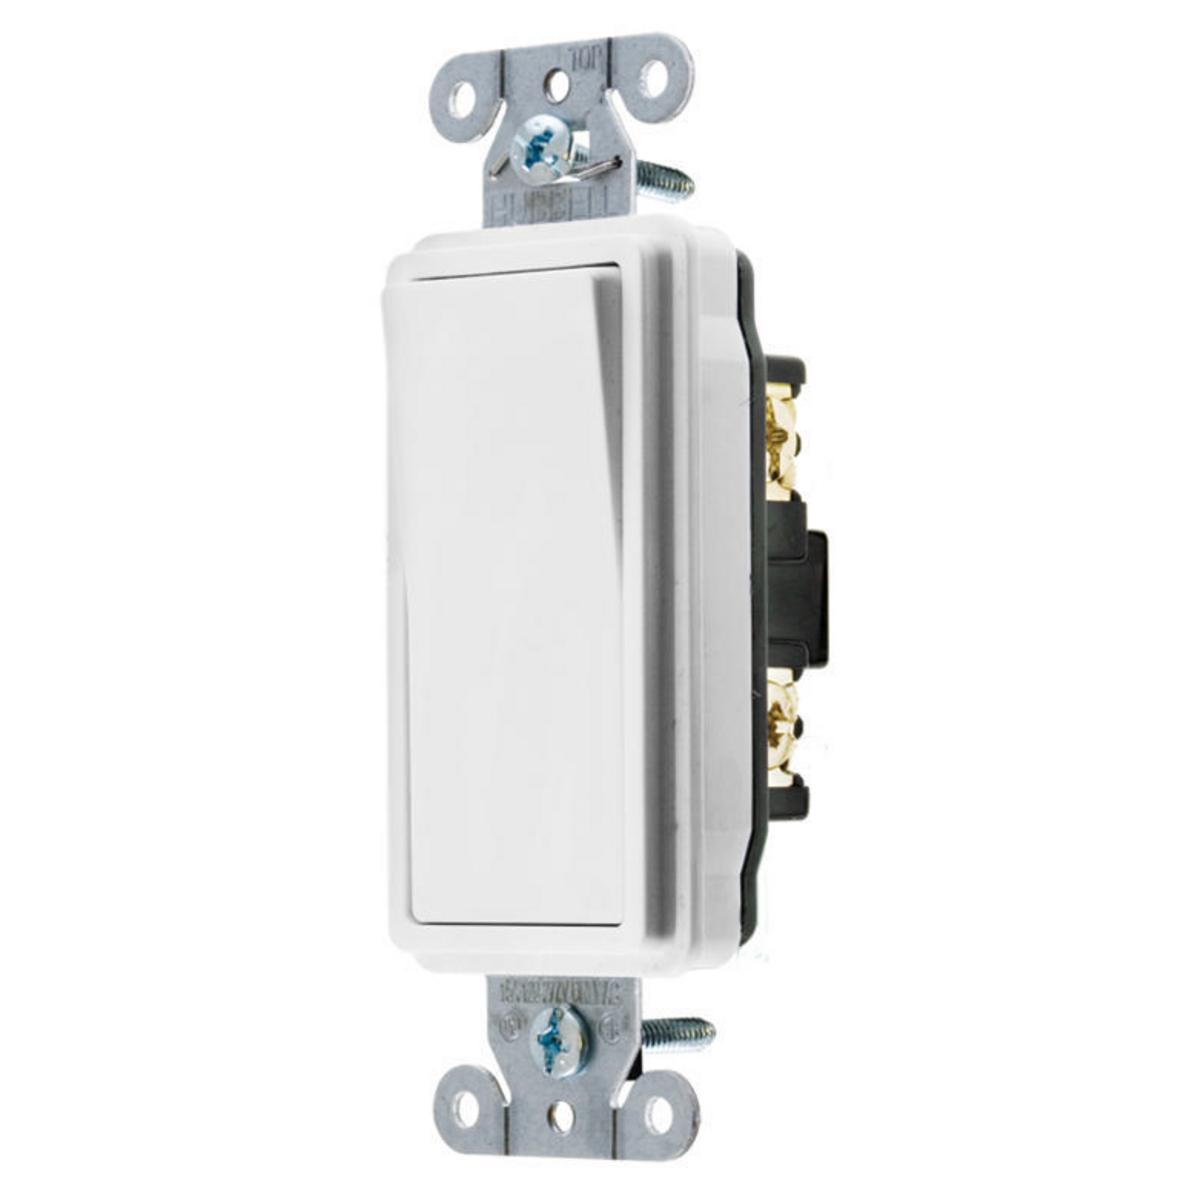 Hubbell DS420W 20 Amp 120/277 VAC 4-Way White Rocker Switch